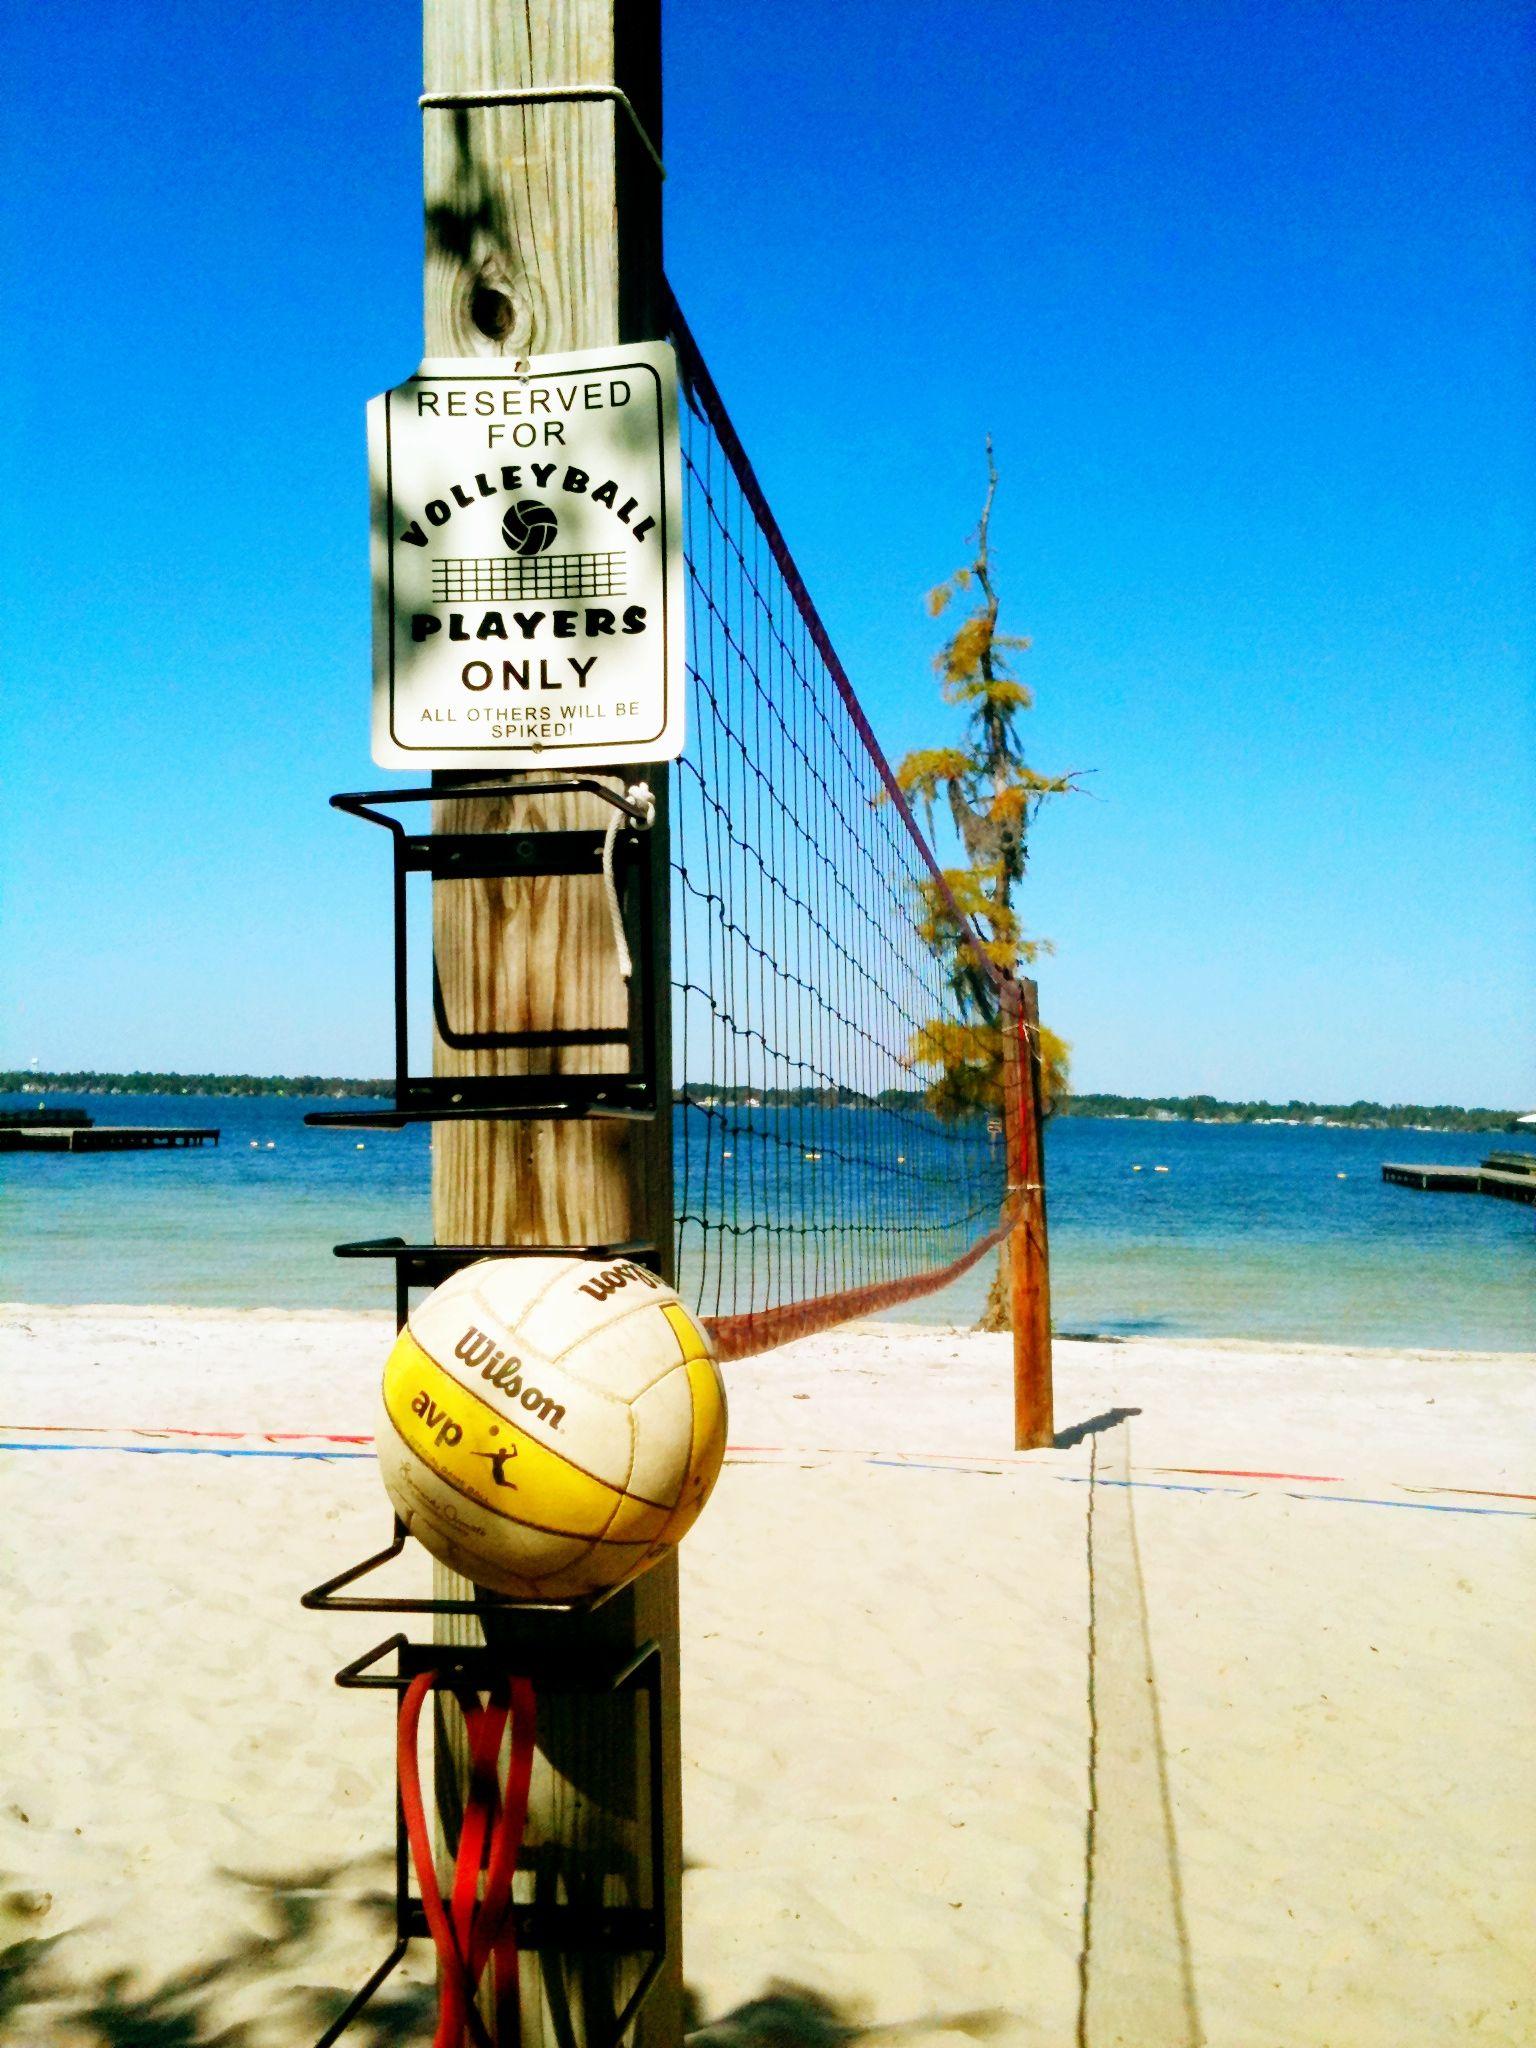 Pin By Sangkorn Joe On Retro Stlye Beach Volleyball Volleyball Volleyball Players